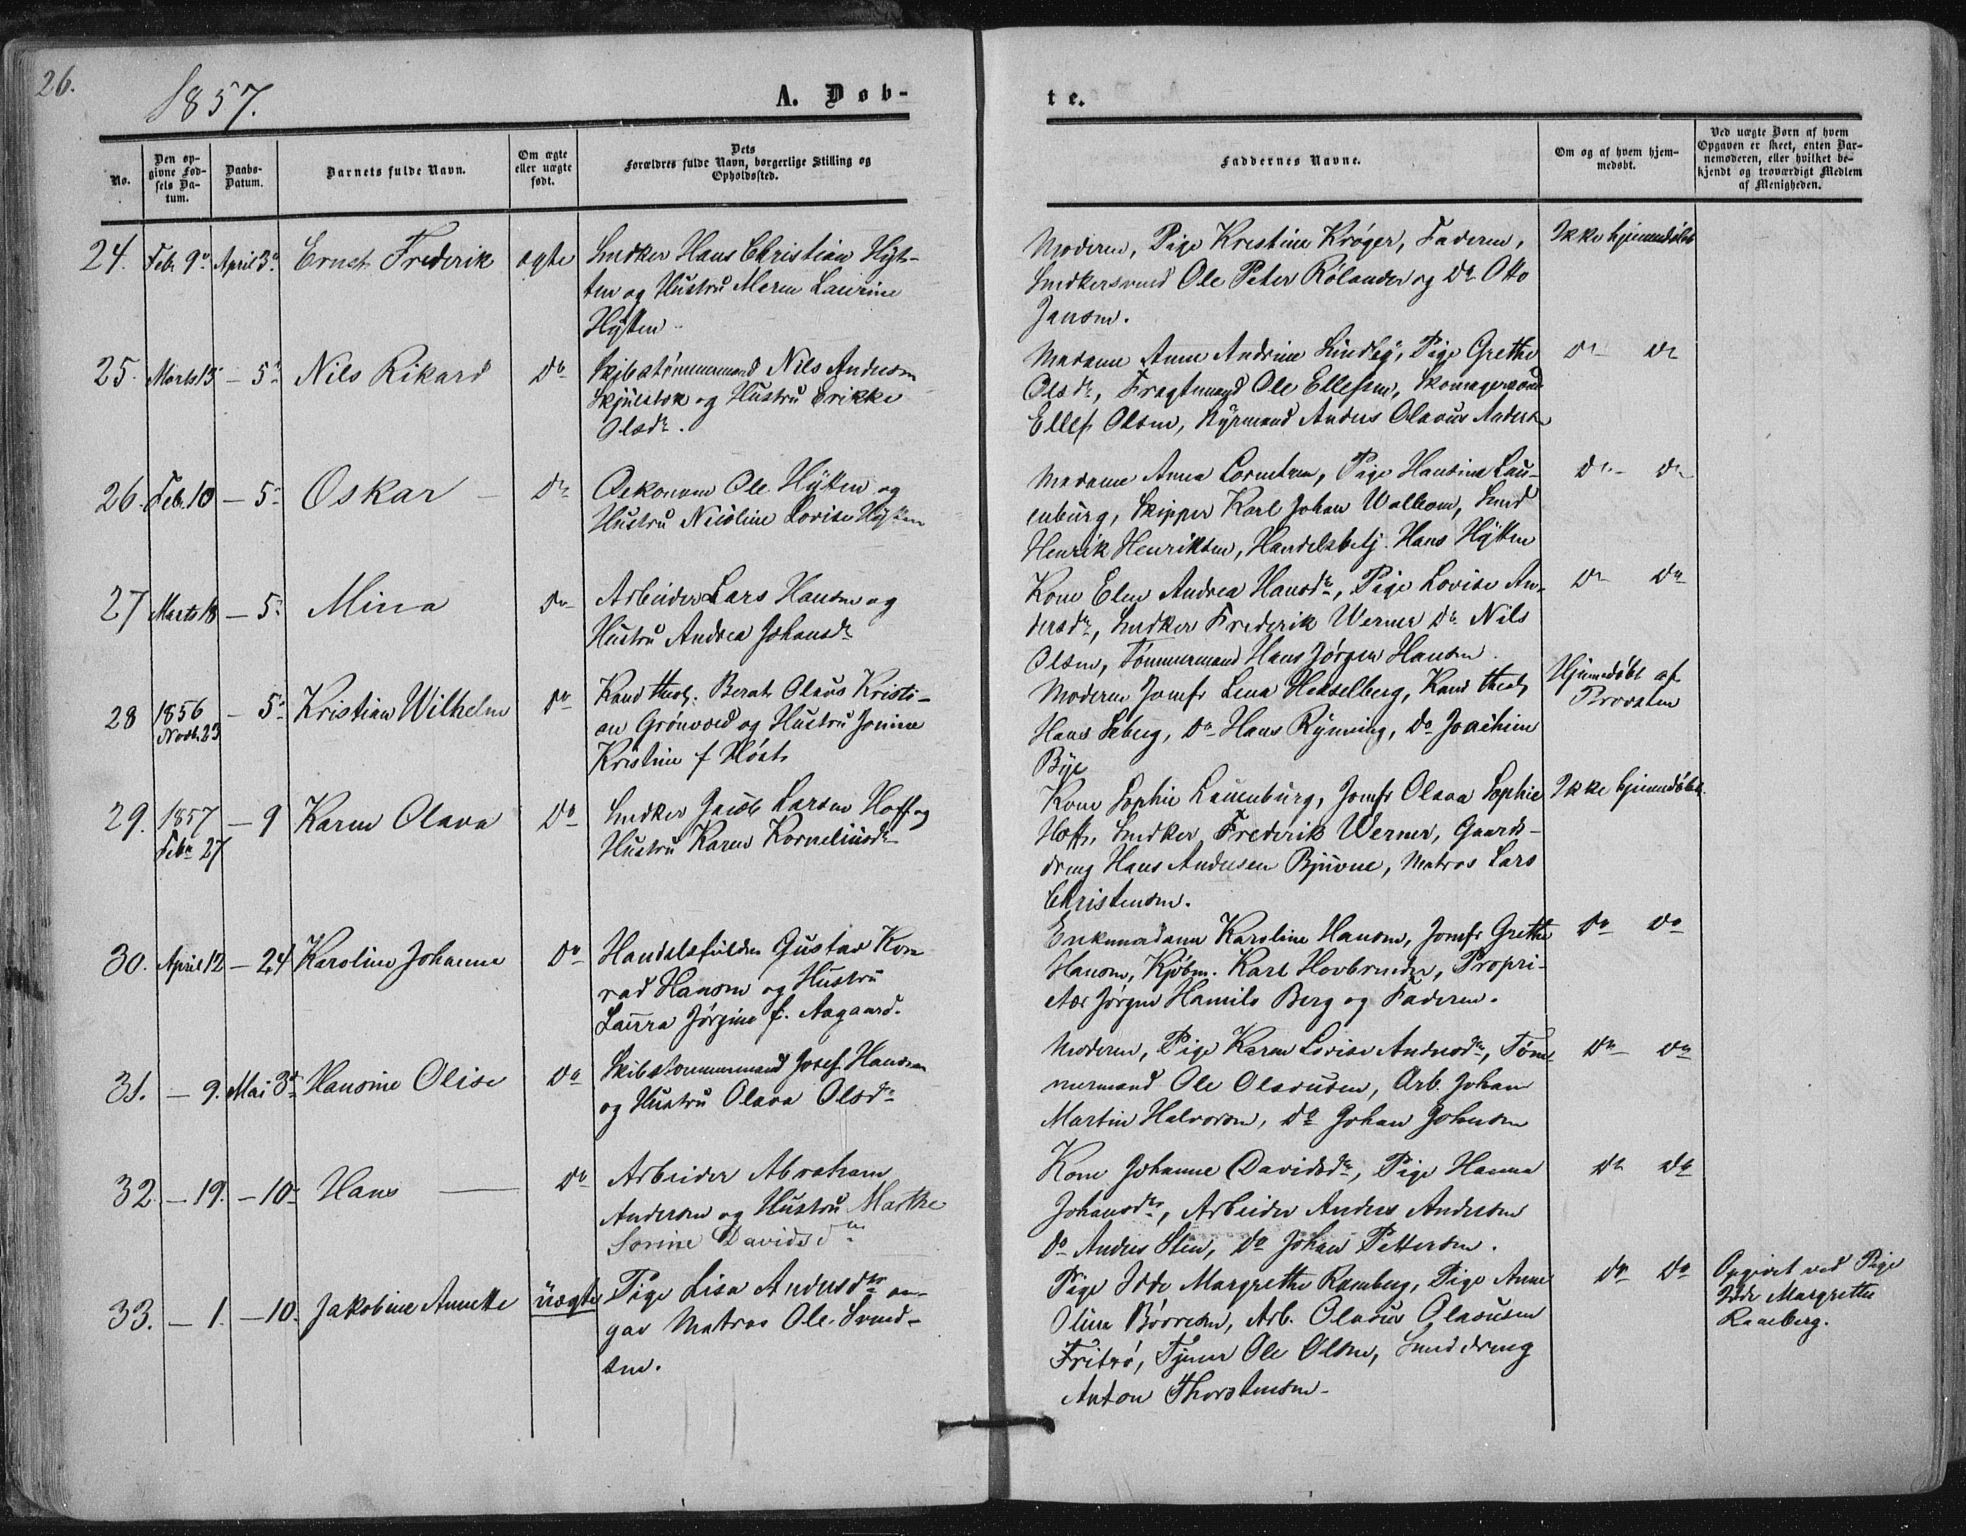 SAKO, Tønsberg kirkebøker, F/Fa/L0008: Ministerialbok nr. I 8, 1855-1864, s. 26